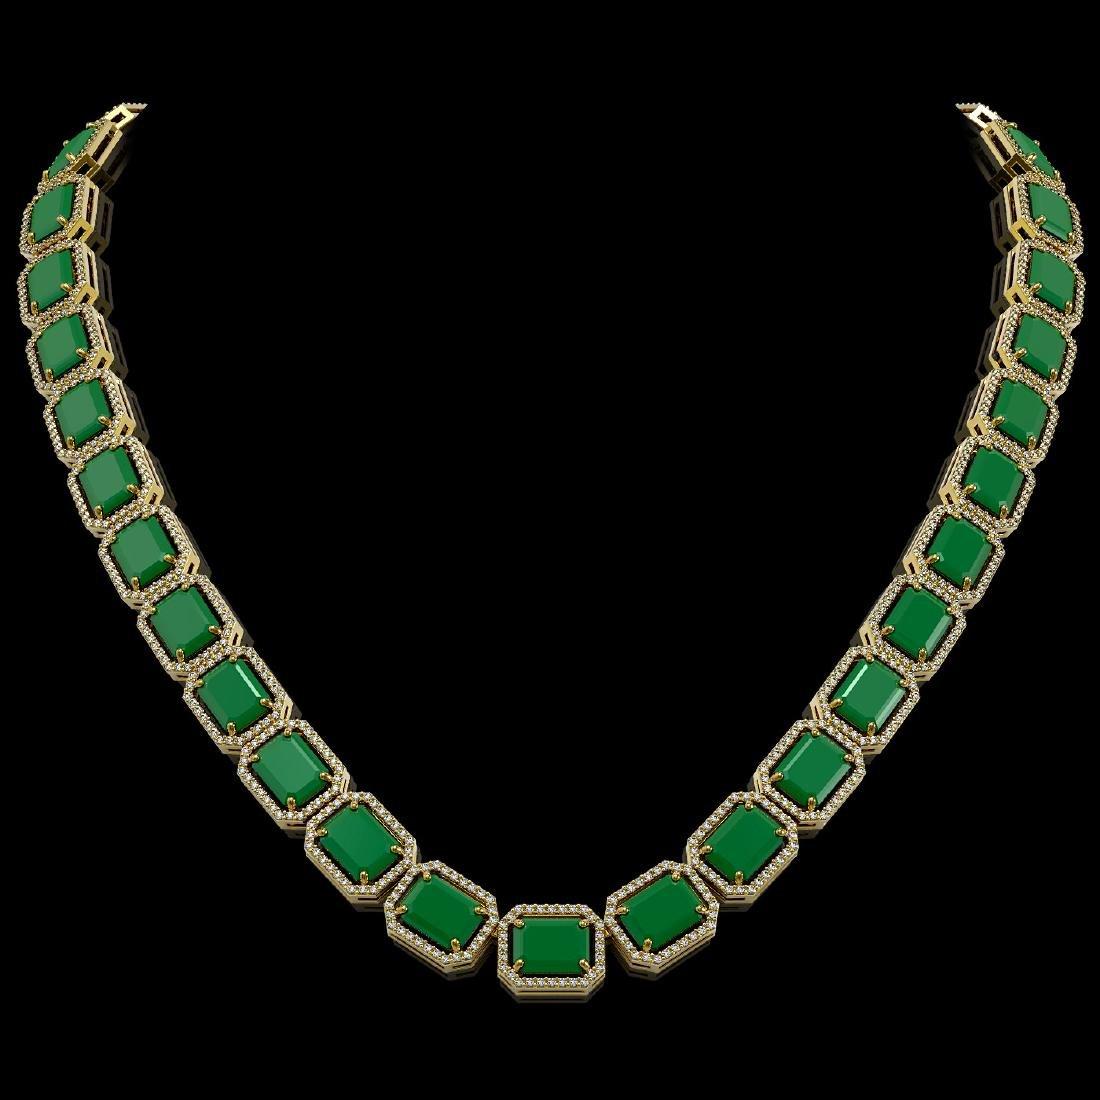 84.94 CTW Emerald & Diamond Halo Necklace 10K Yellow